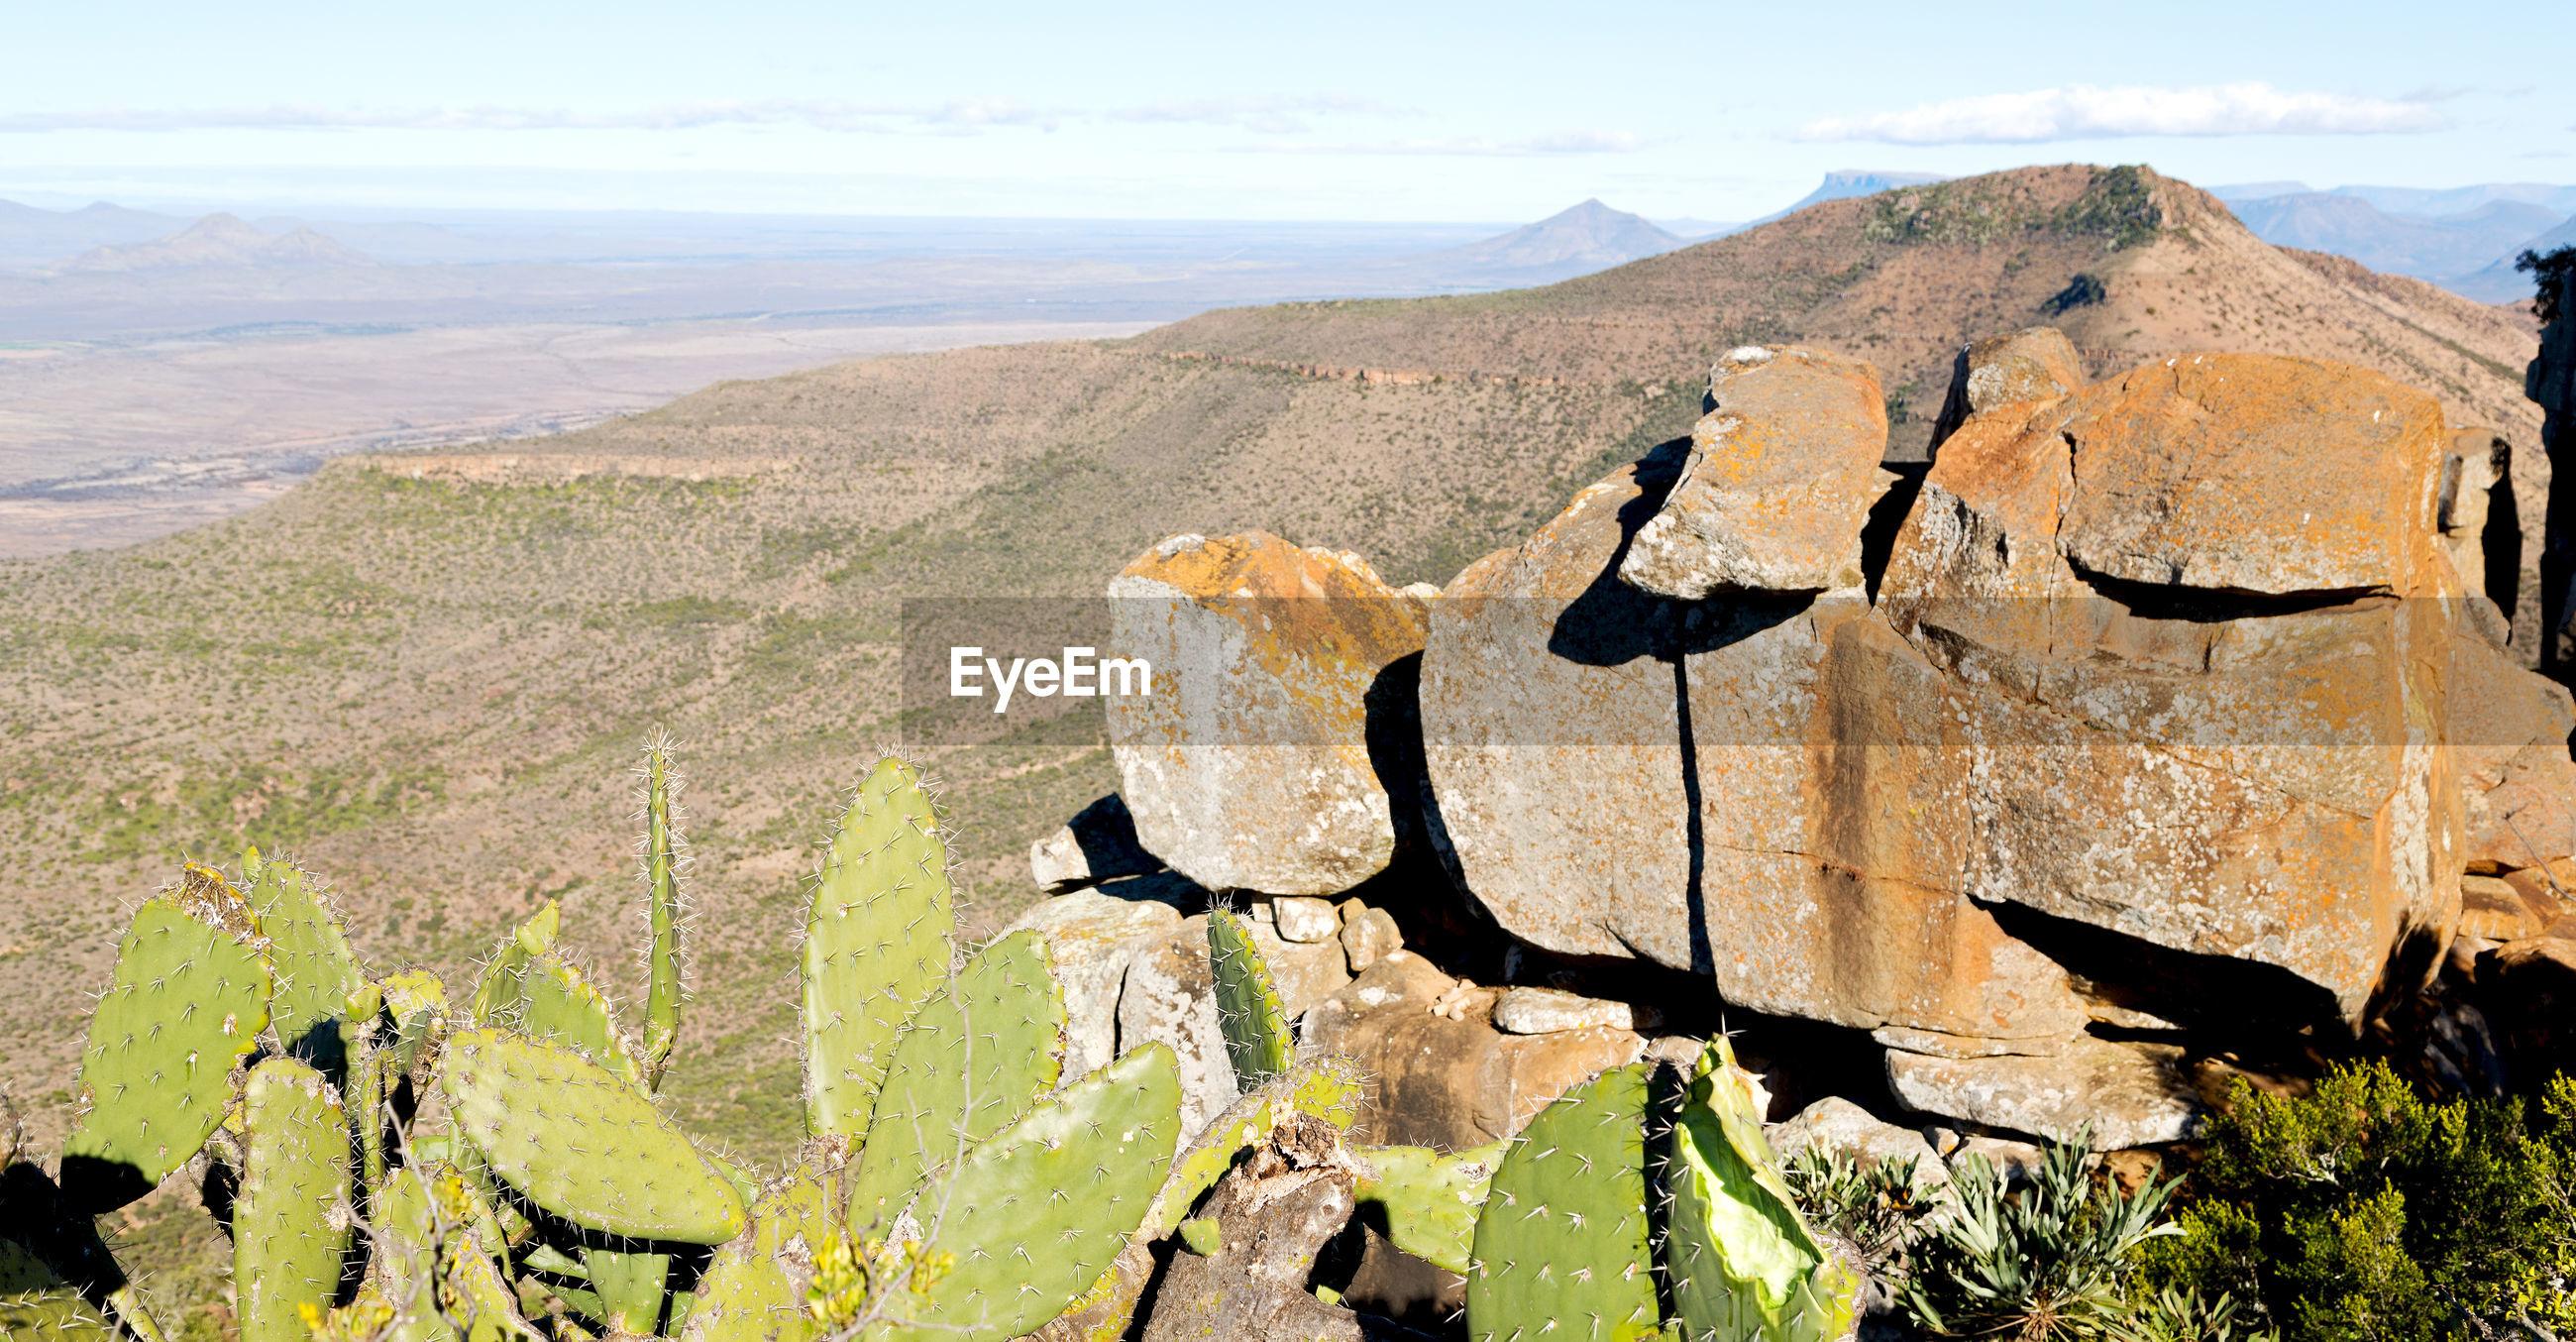 VIEW OF ROCKS ON MOUNTAIN